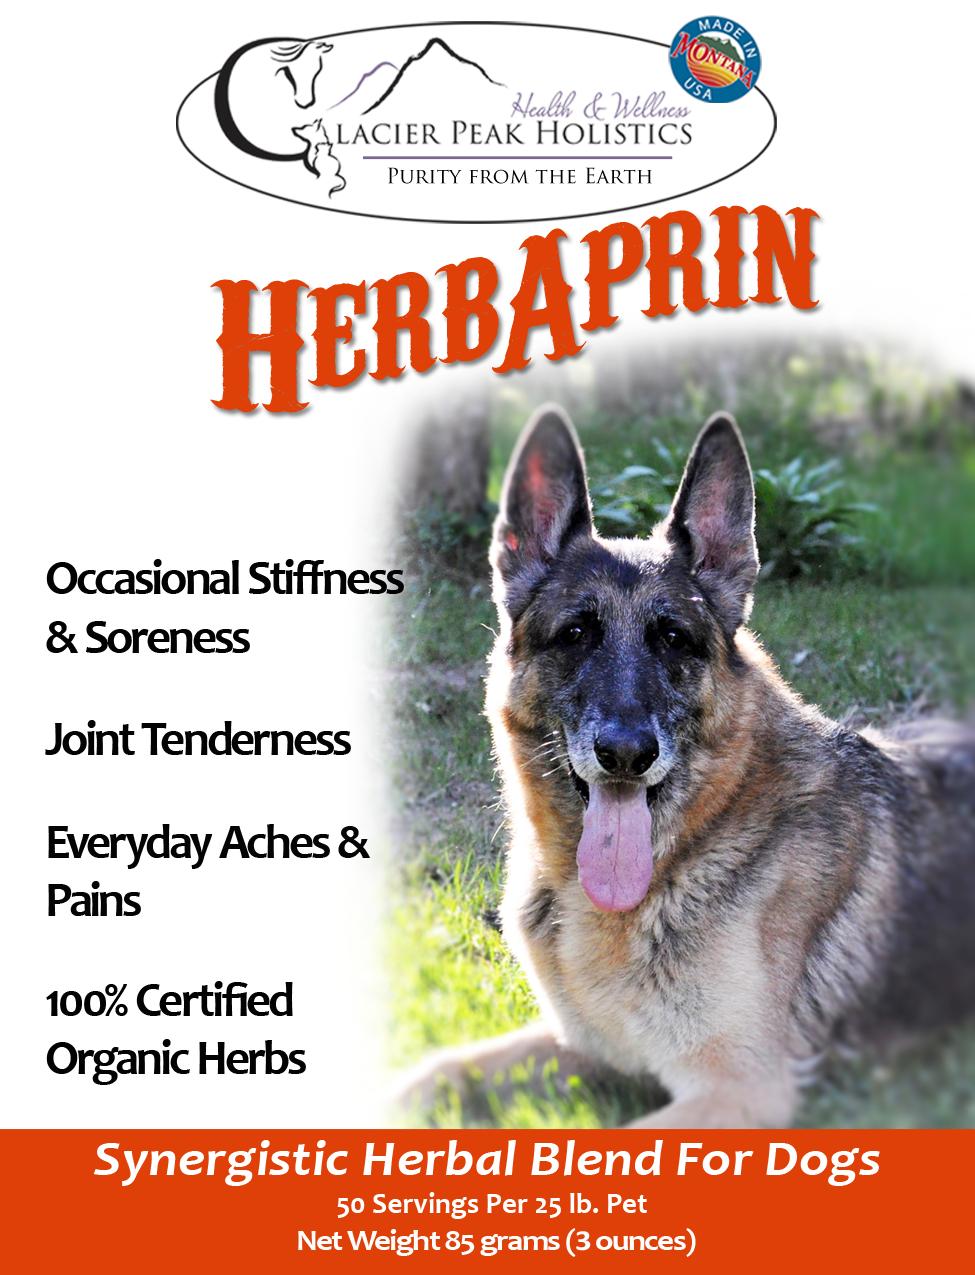 Glacier Peak Holistics HerbAprin Powder Dog Supplement, 12-oz